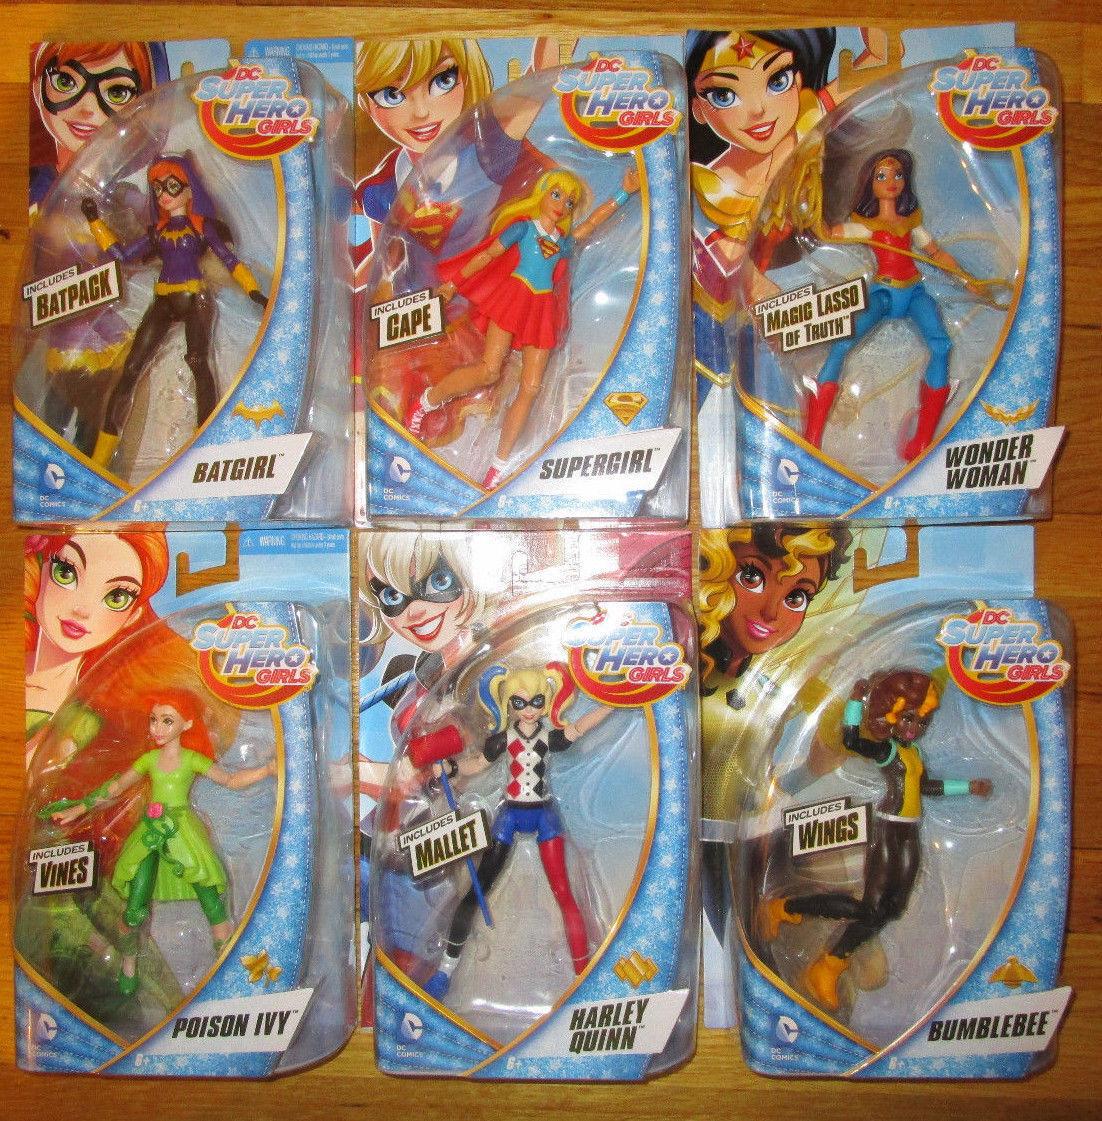 DC SUPER SUPER SUPER HERO GIRLS FIGURE SET WONDER WOMAN SUPERGIRL HARLEY IVY BATGIRL BUMBLE 7ce9b1